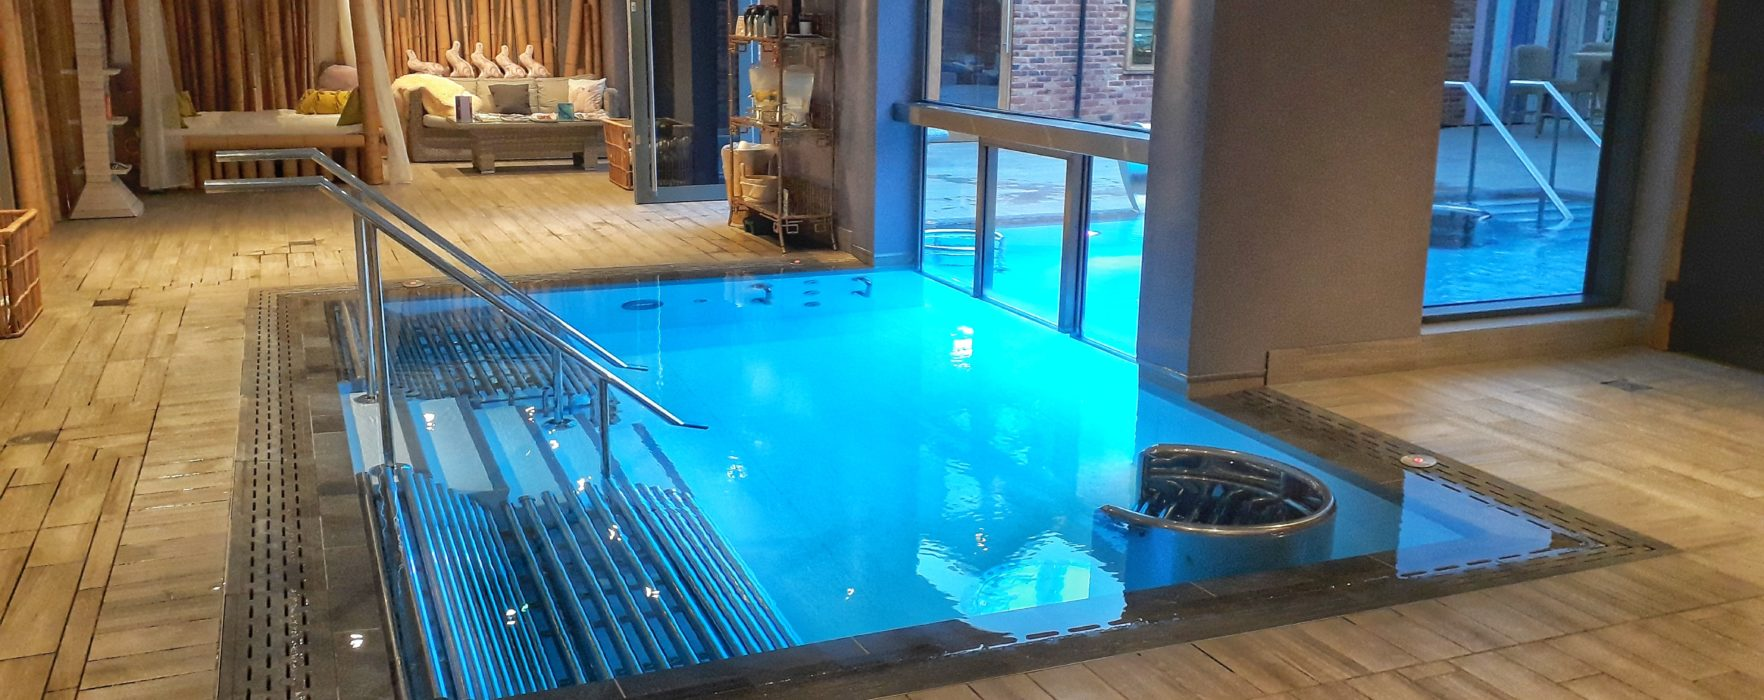 STAYCATION: A weekend getaway at Ye Olde Bell Hotel & Spa